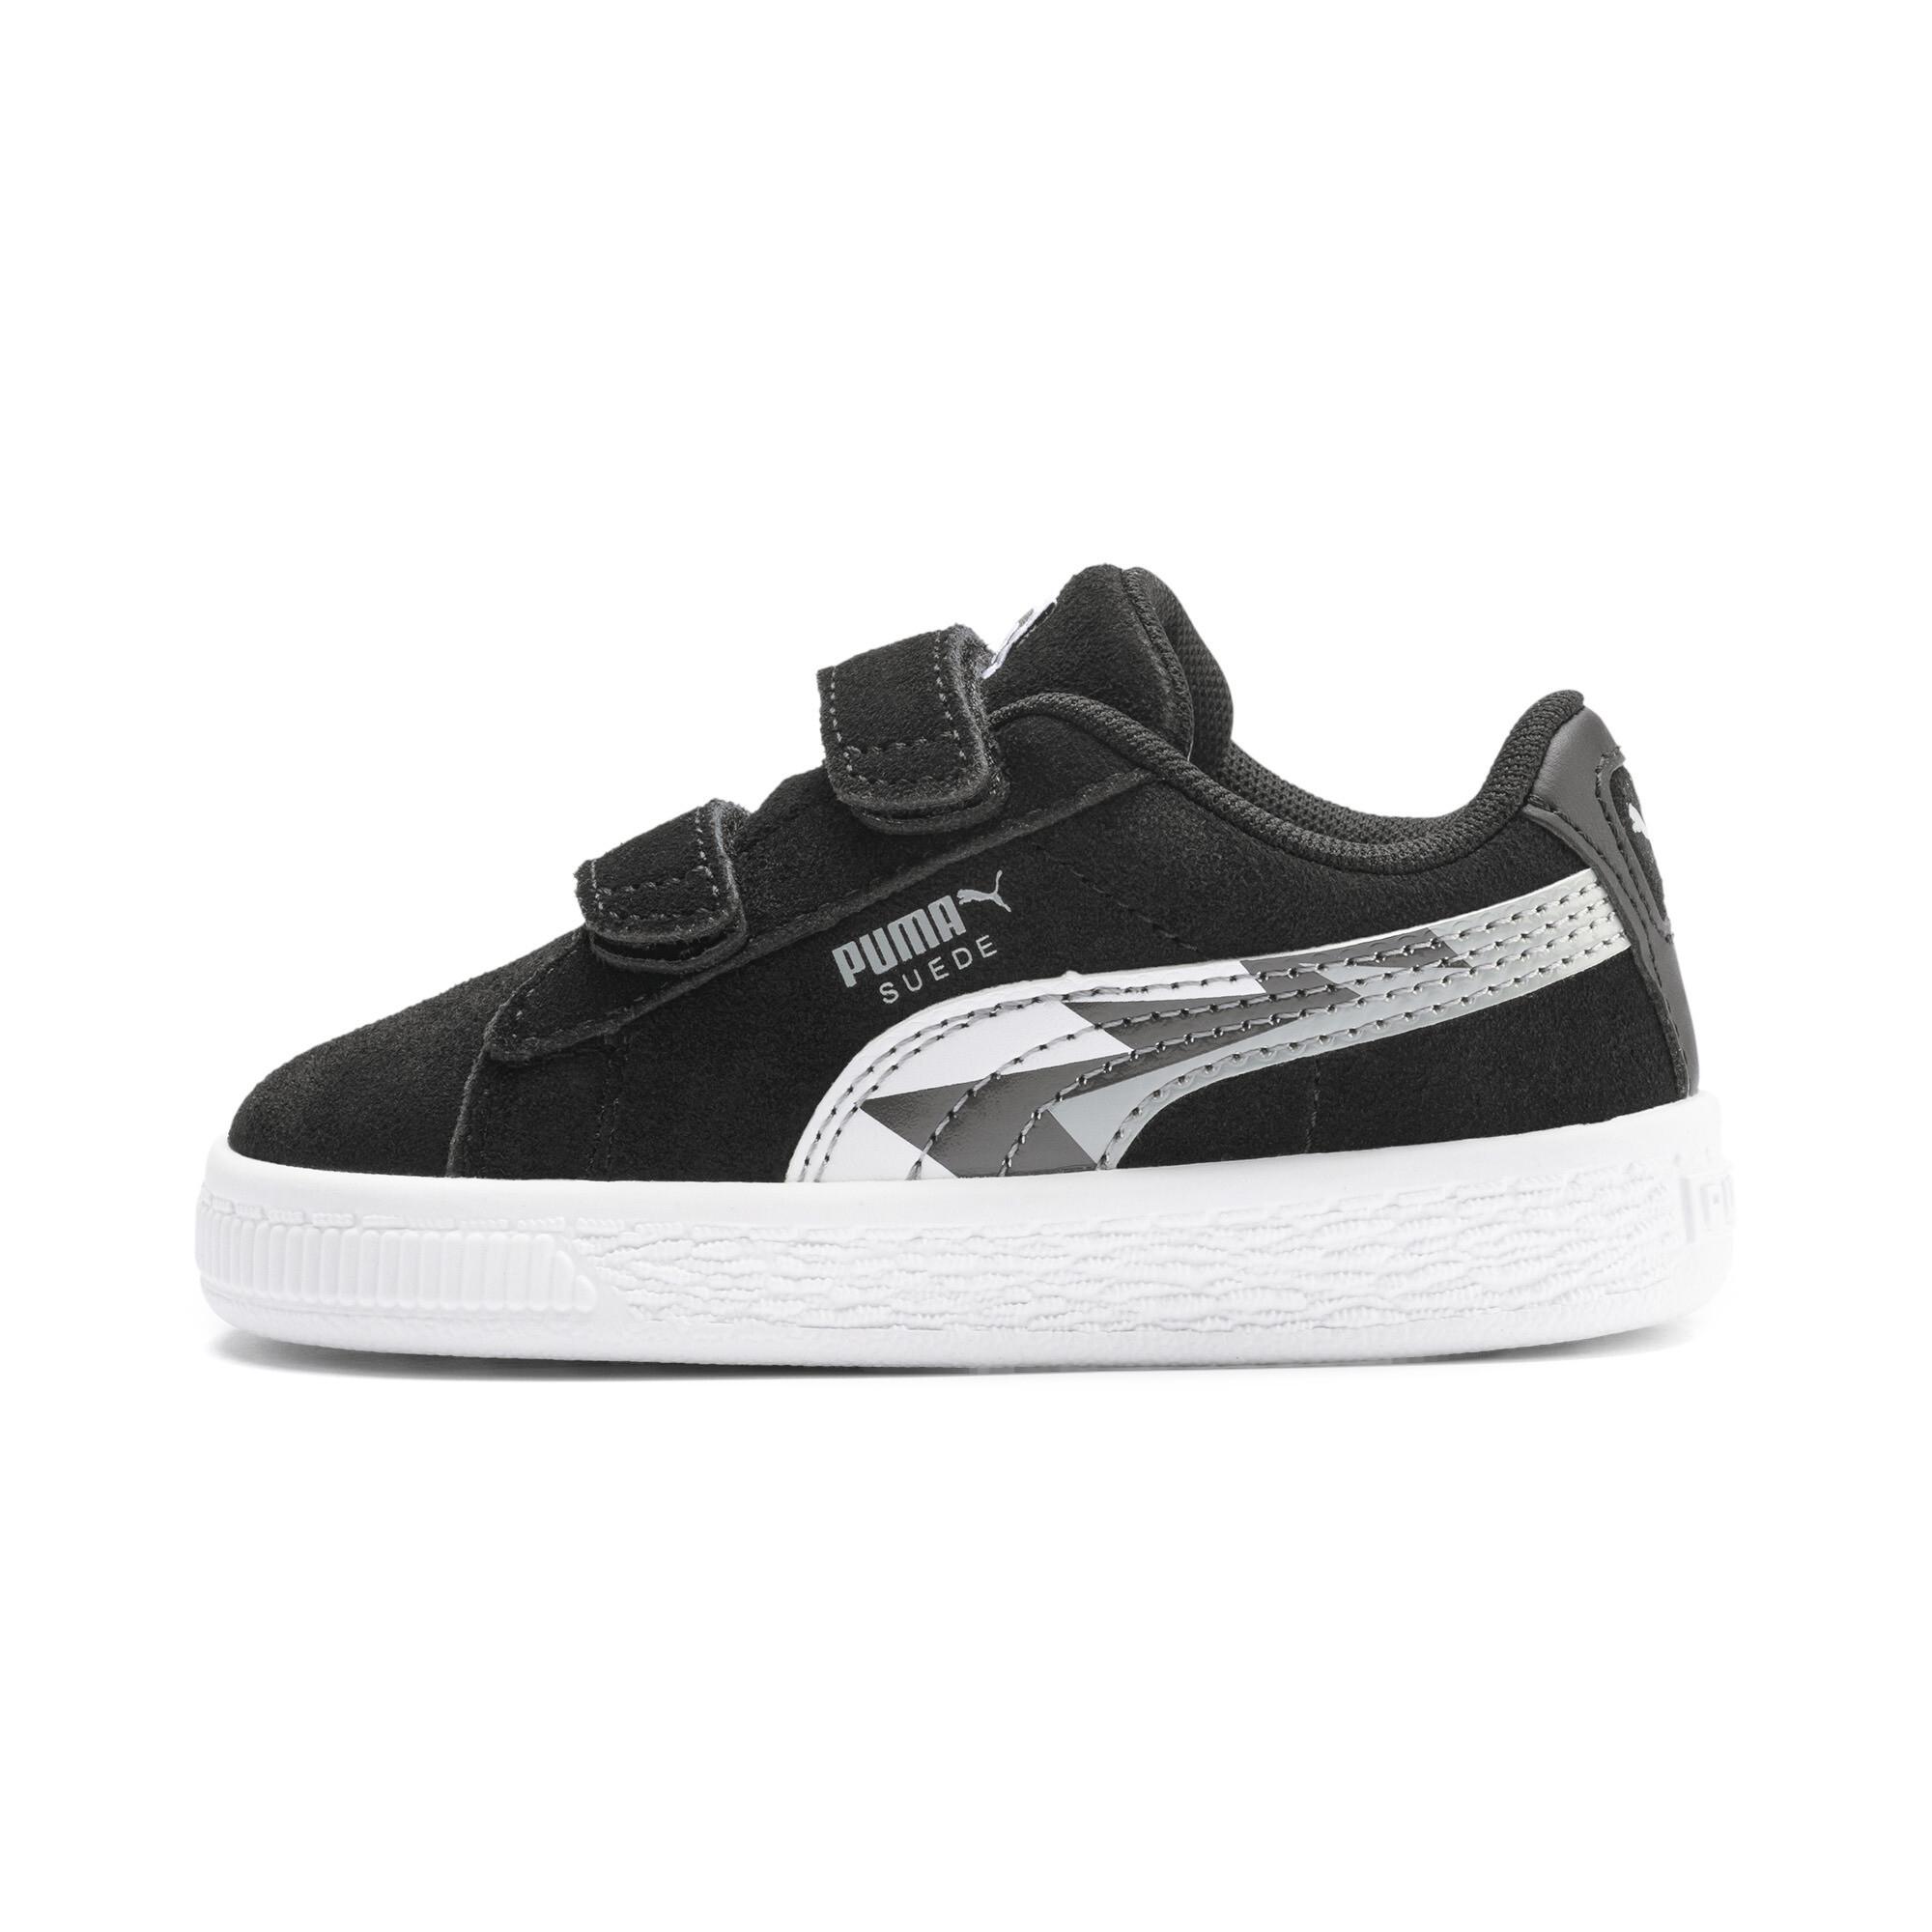 PUMA-Suede-Classic-Lightning-Toddler-Shoes-Boys-Shoe-Kids thumbnail 4